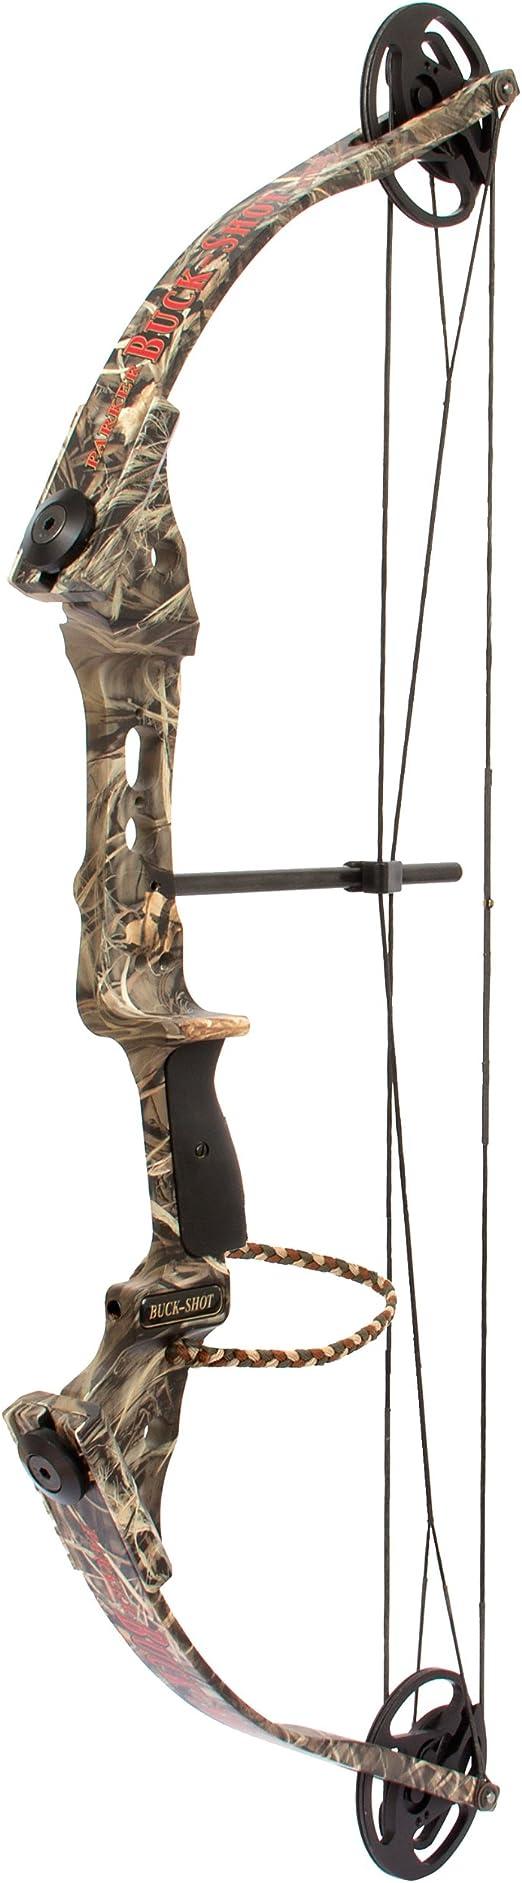 alimenté par PhyX Archery PARKER Buckshot Compound Bow String /& Câble Sets